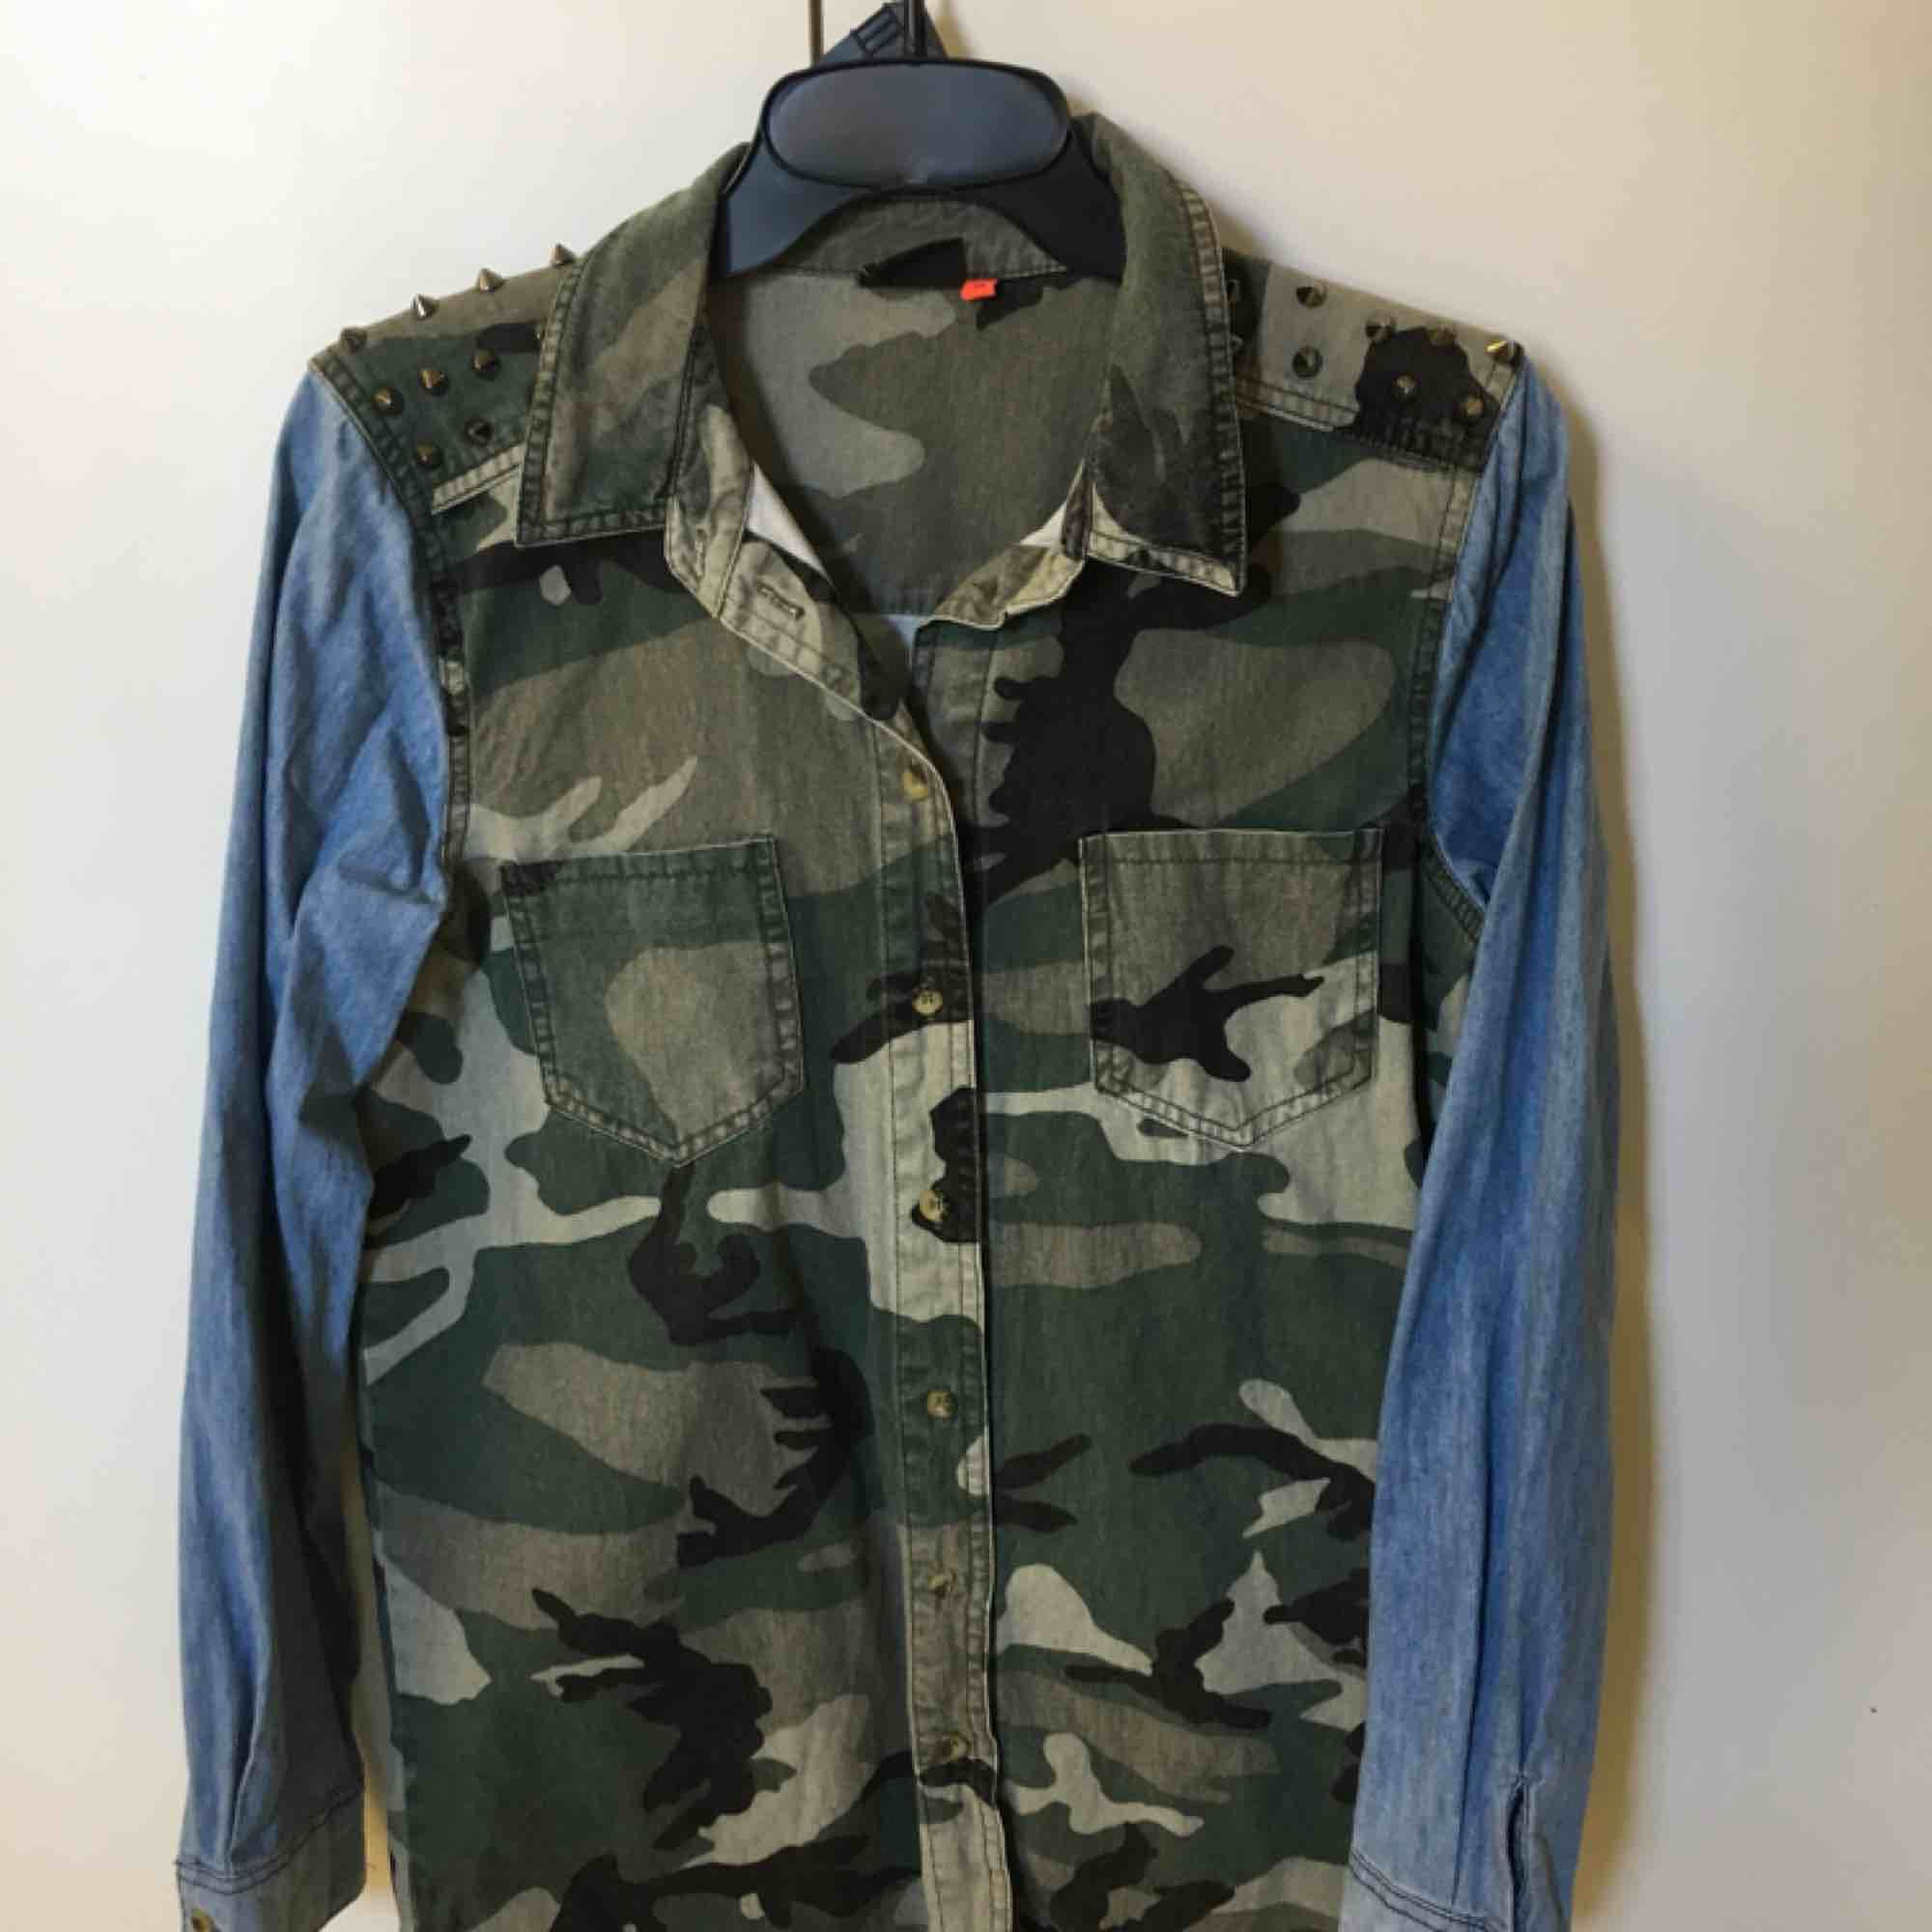 Jeans/kamouflage skjorta med nitar på axlarna. Storlek M. . Skjortor.